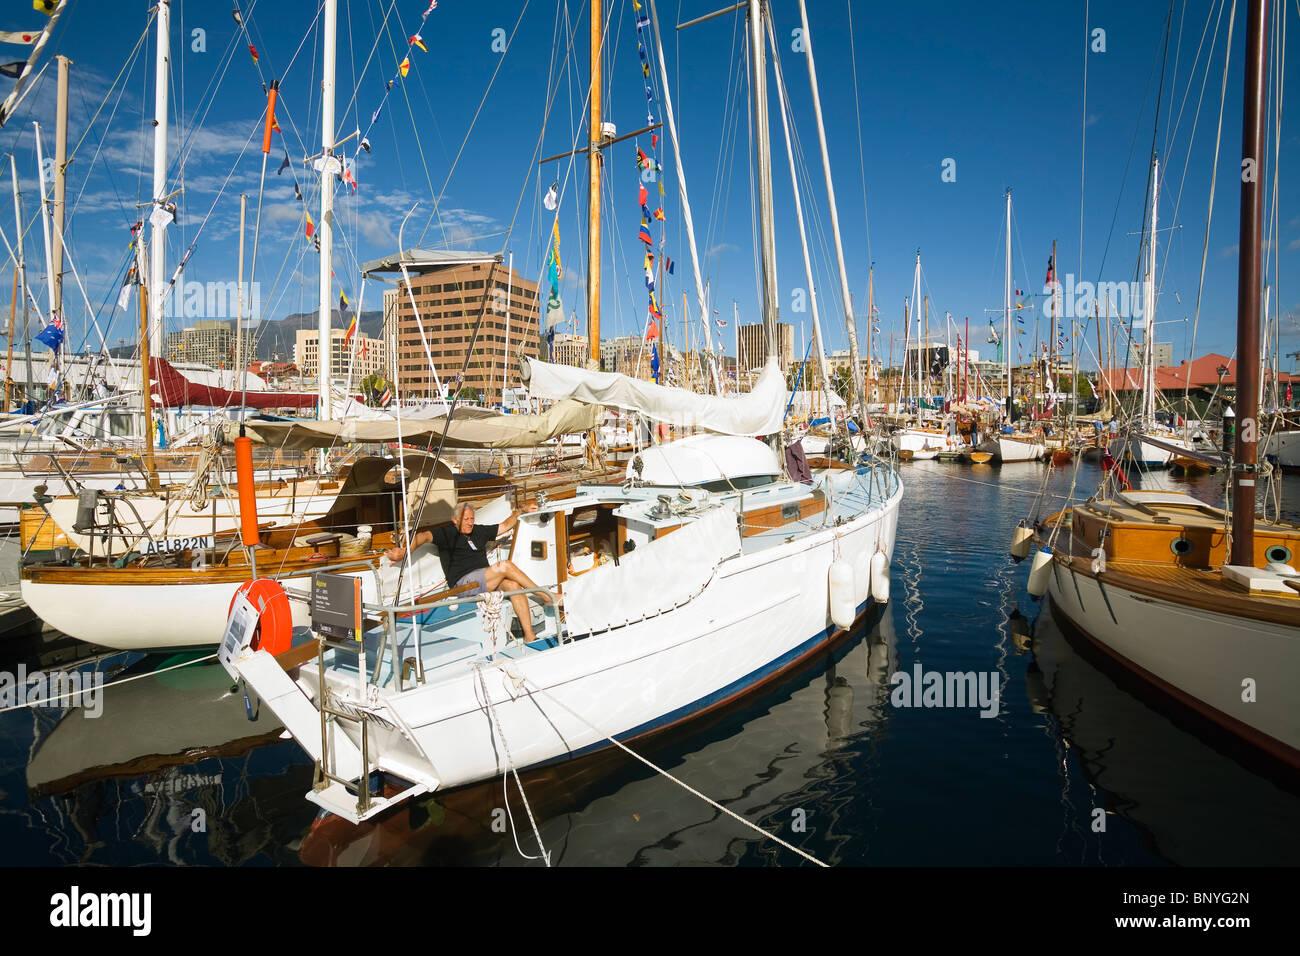 Wooden boat festival.  Hobart, Tasmania, AUSTRALIA Stock Photo